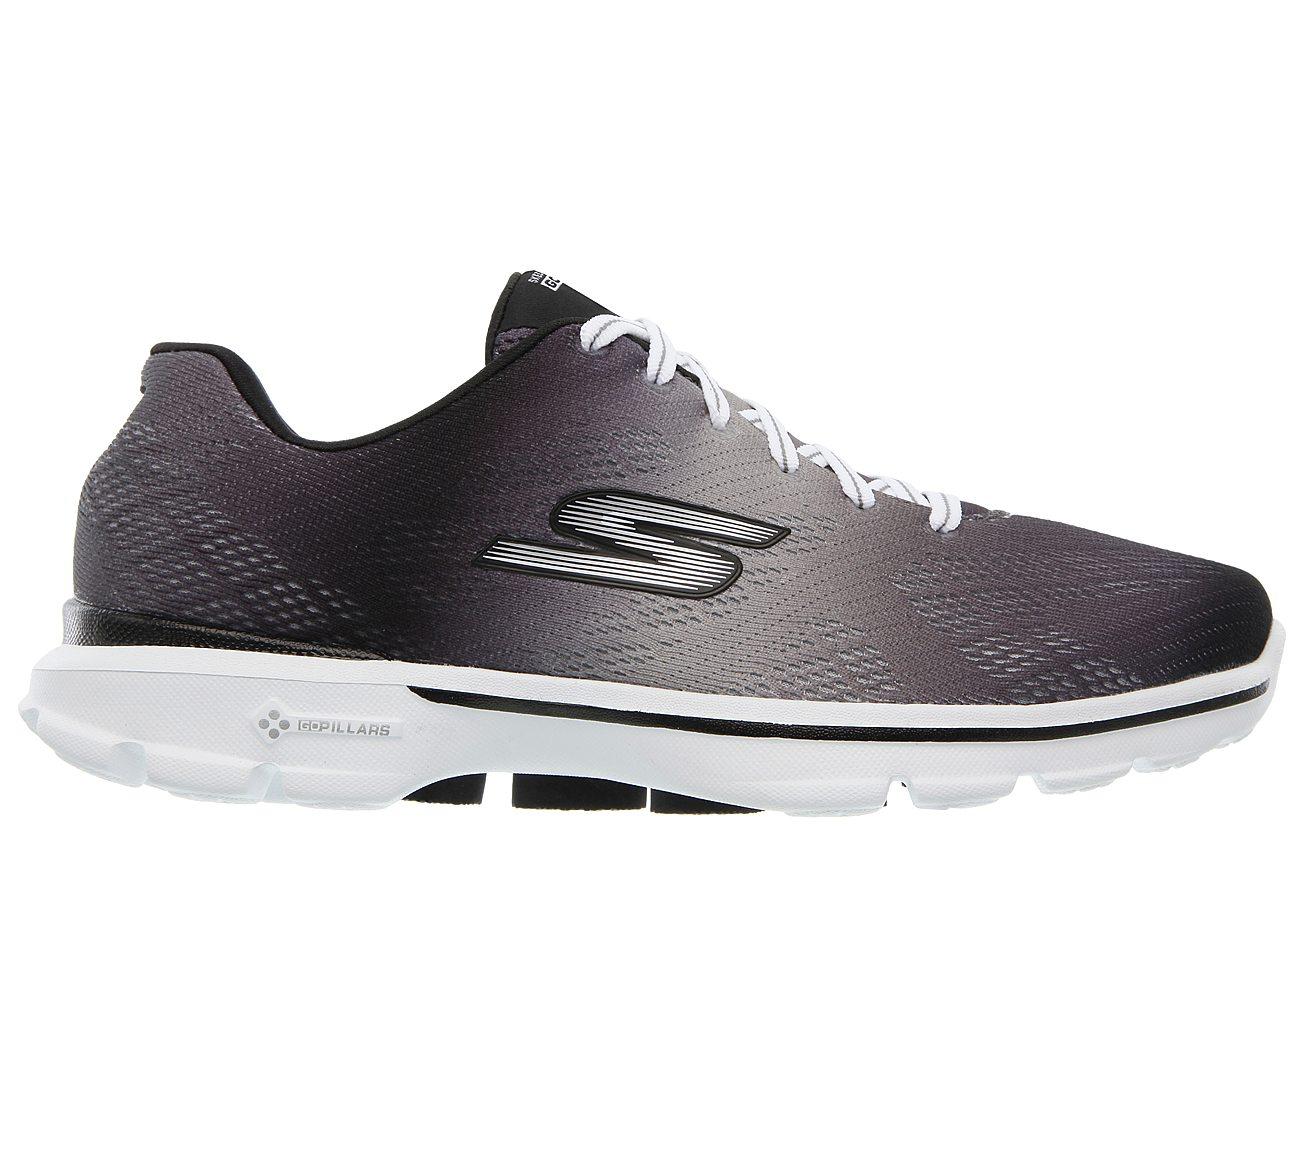 Skechers Shoes  Skechers Go GO Pulse 14032 Womens Sports Shoes BlackWhite